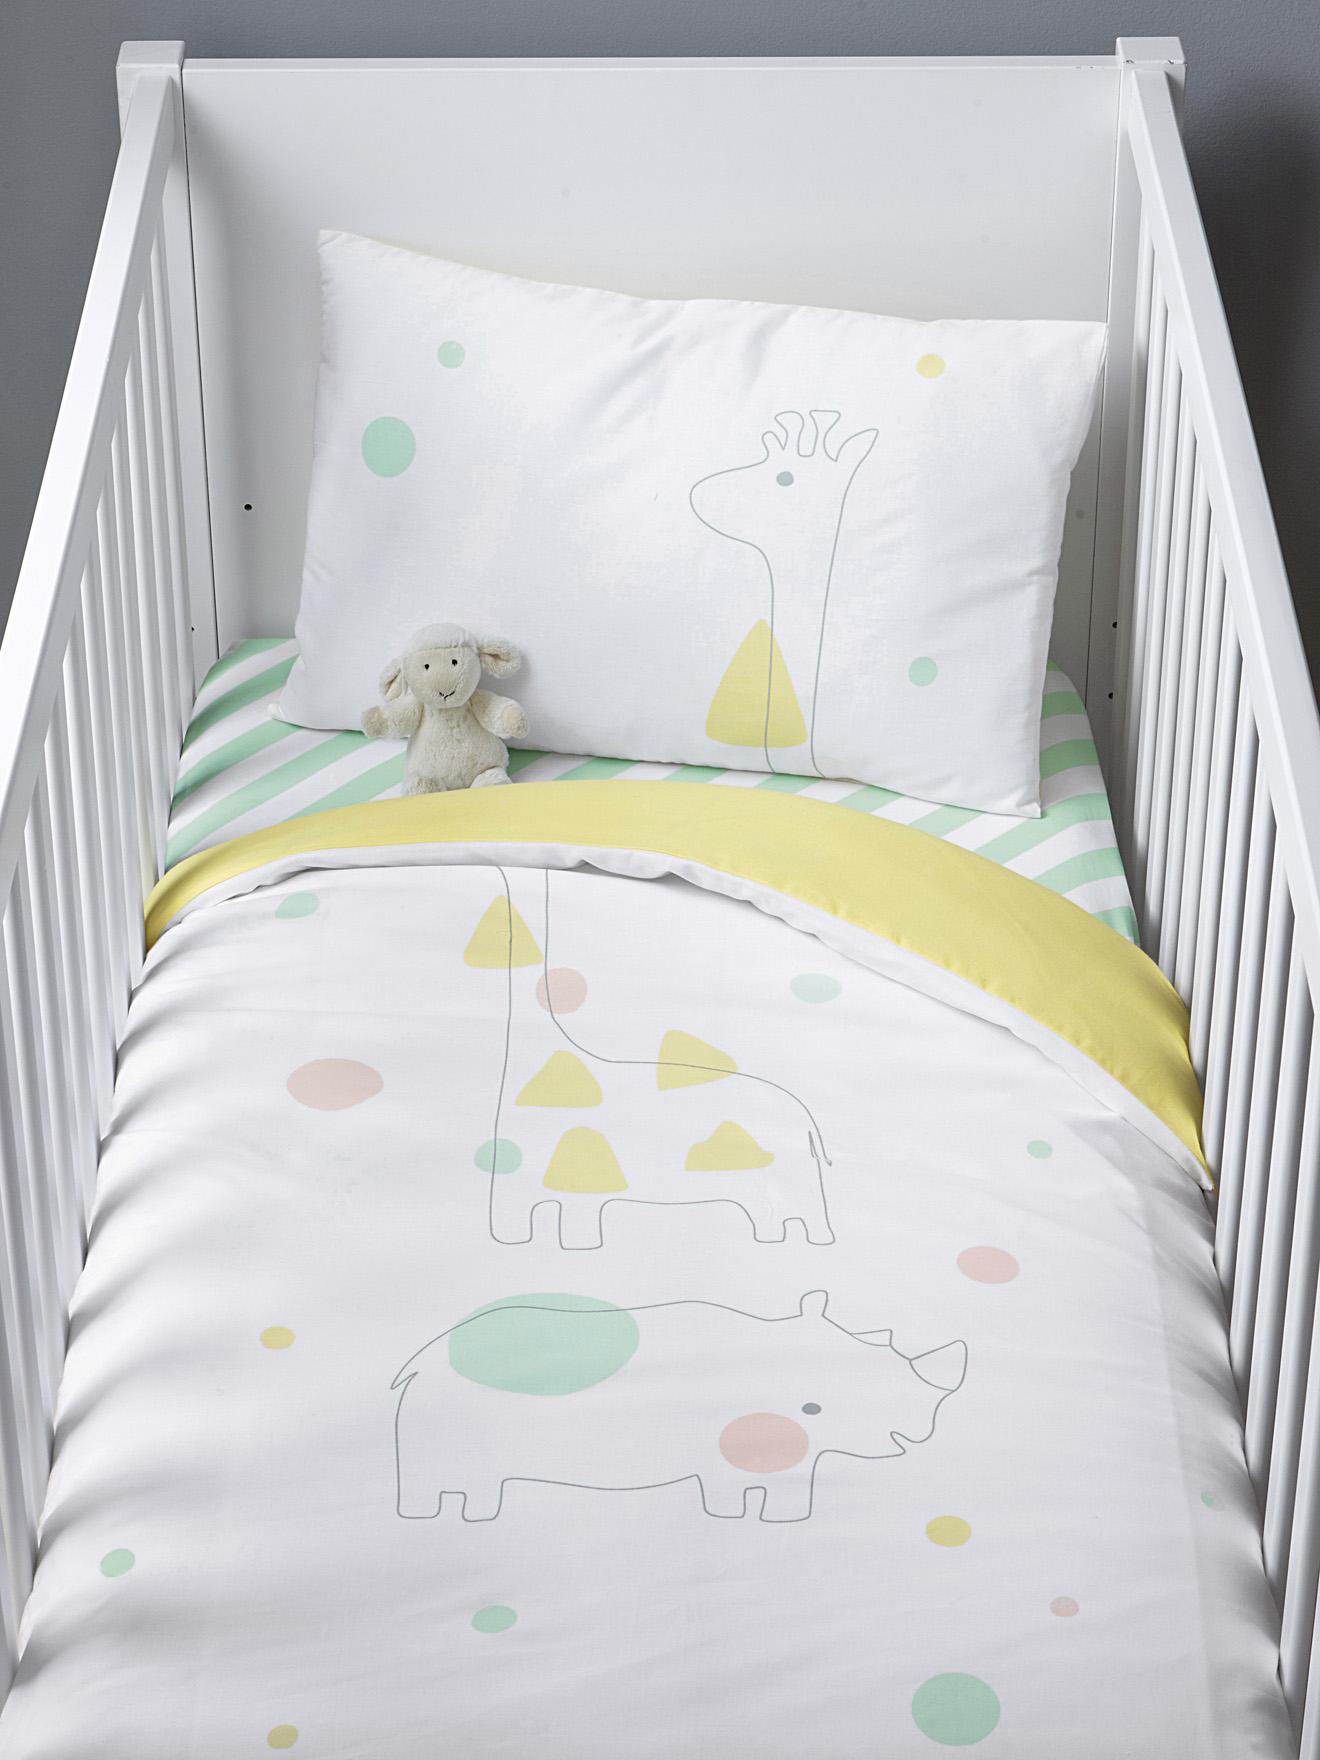 liste de naissance petite herdly ookoodoo. Black Bedroom Furniture Sets. Home Design Ideas